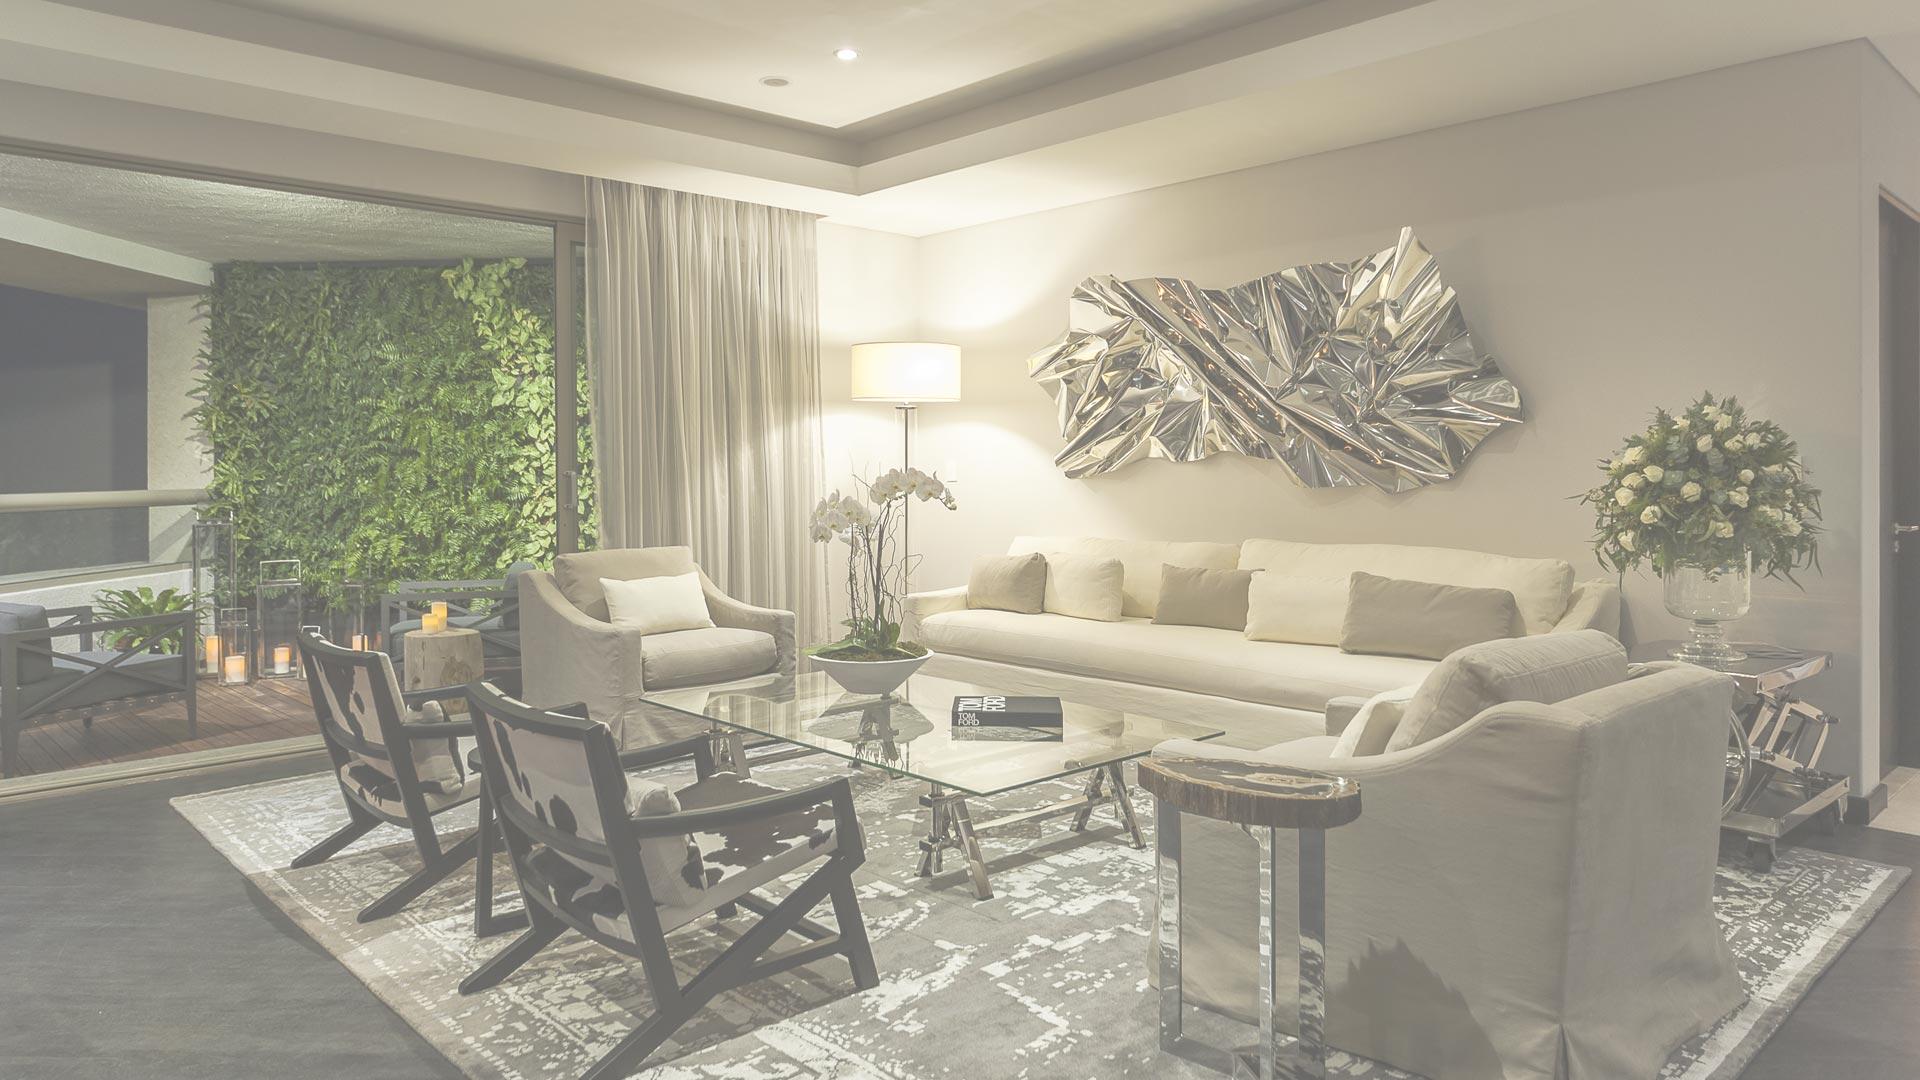 Ho arquitectura de interiores for Arquitecta de interiores